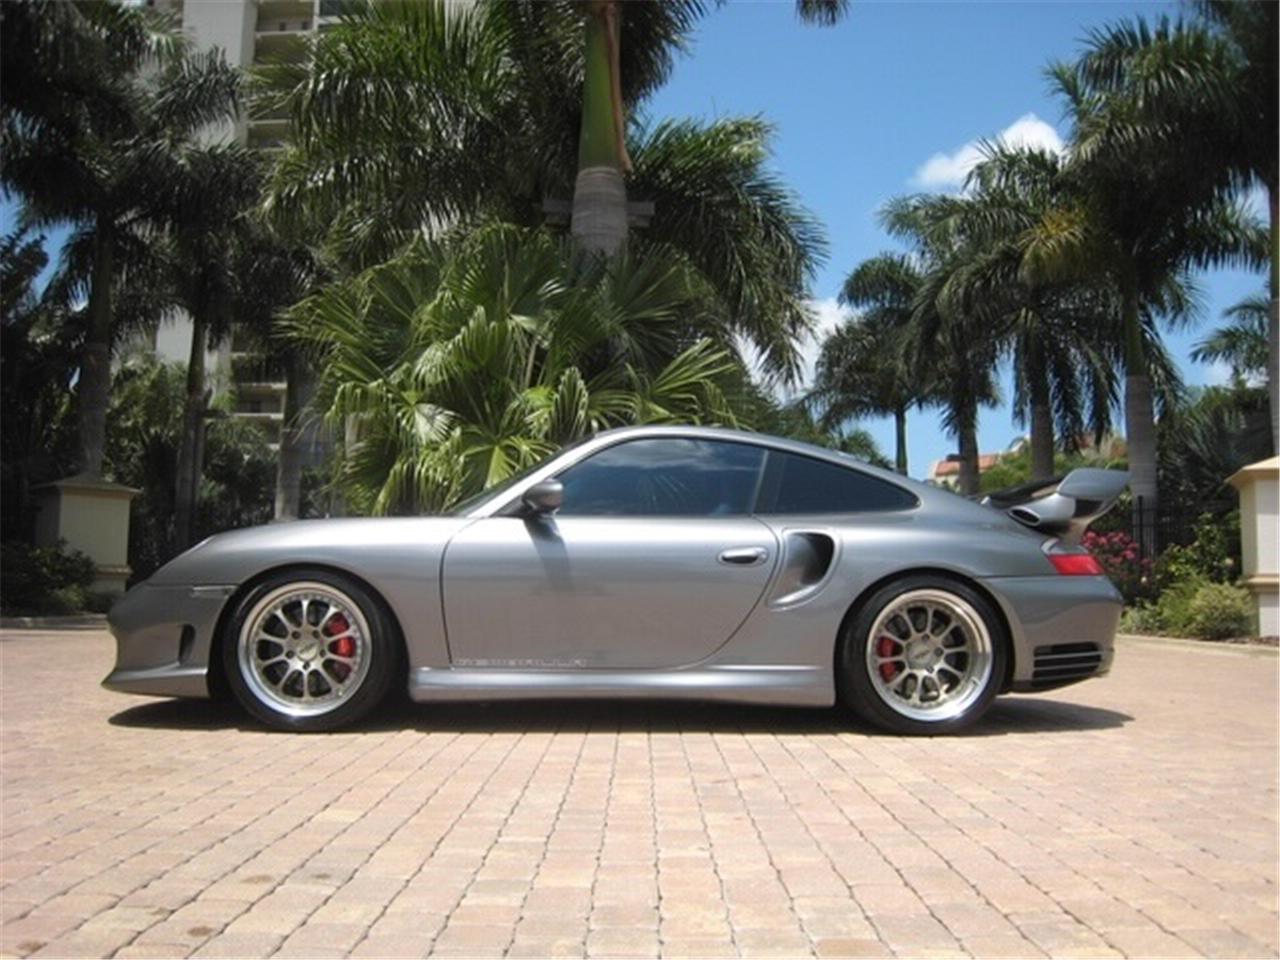 pin porsche 911 turbo - photo #26